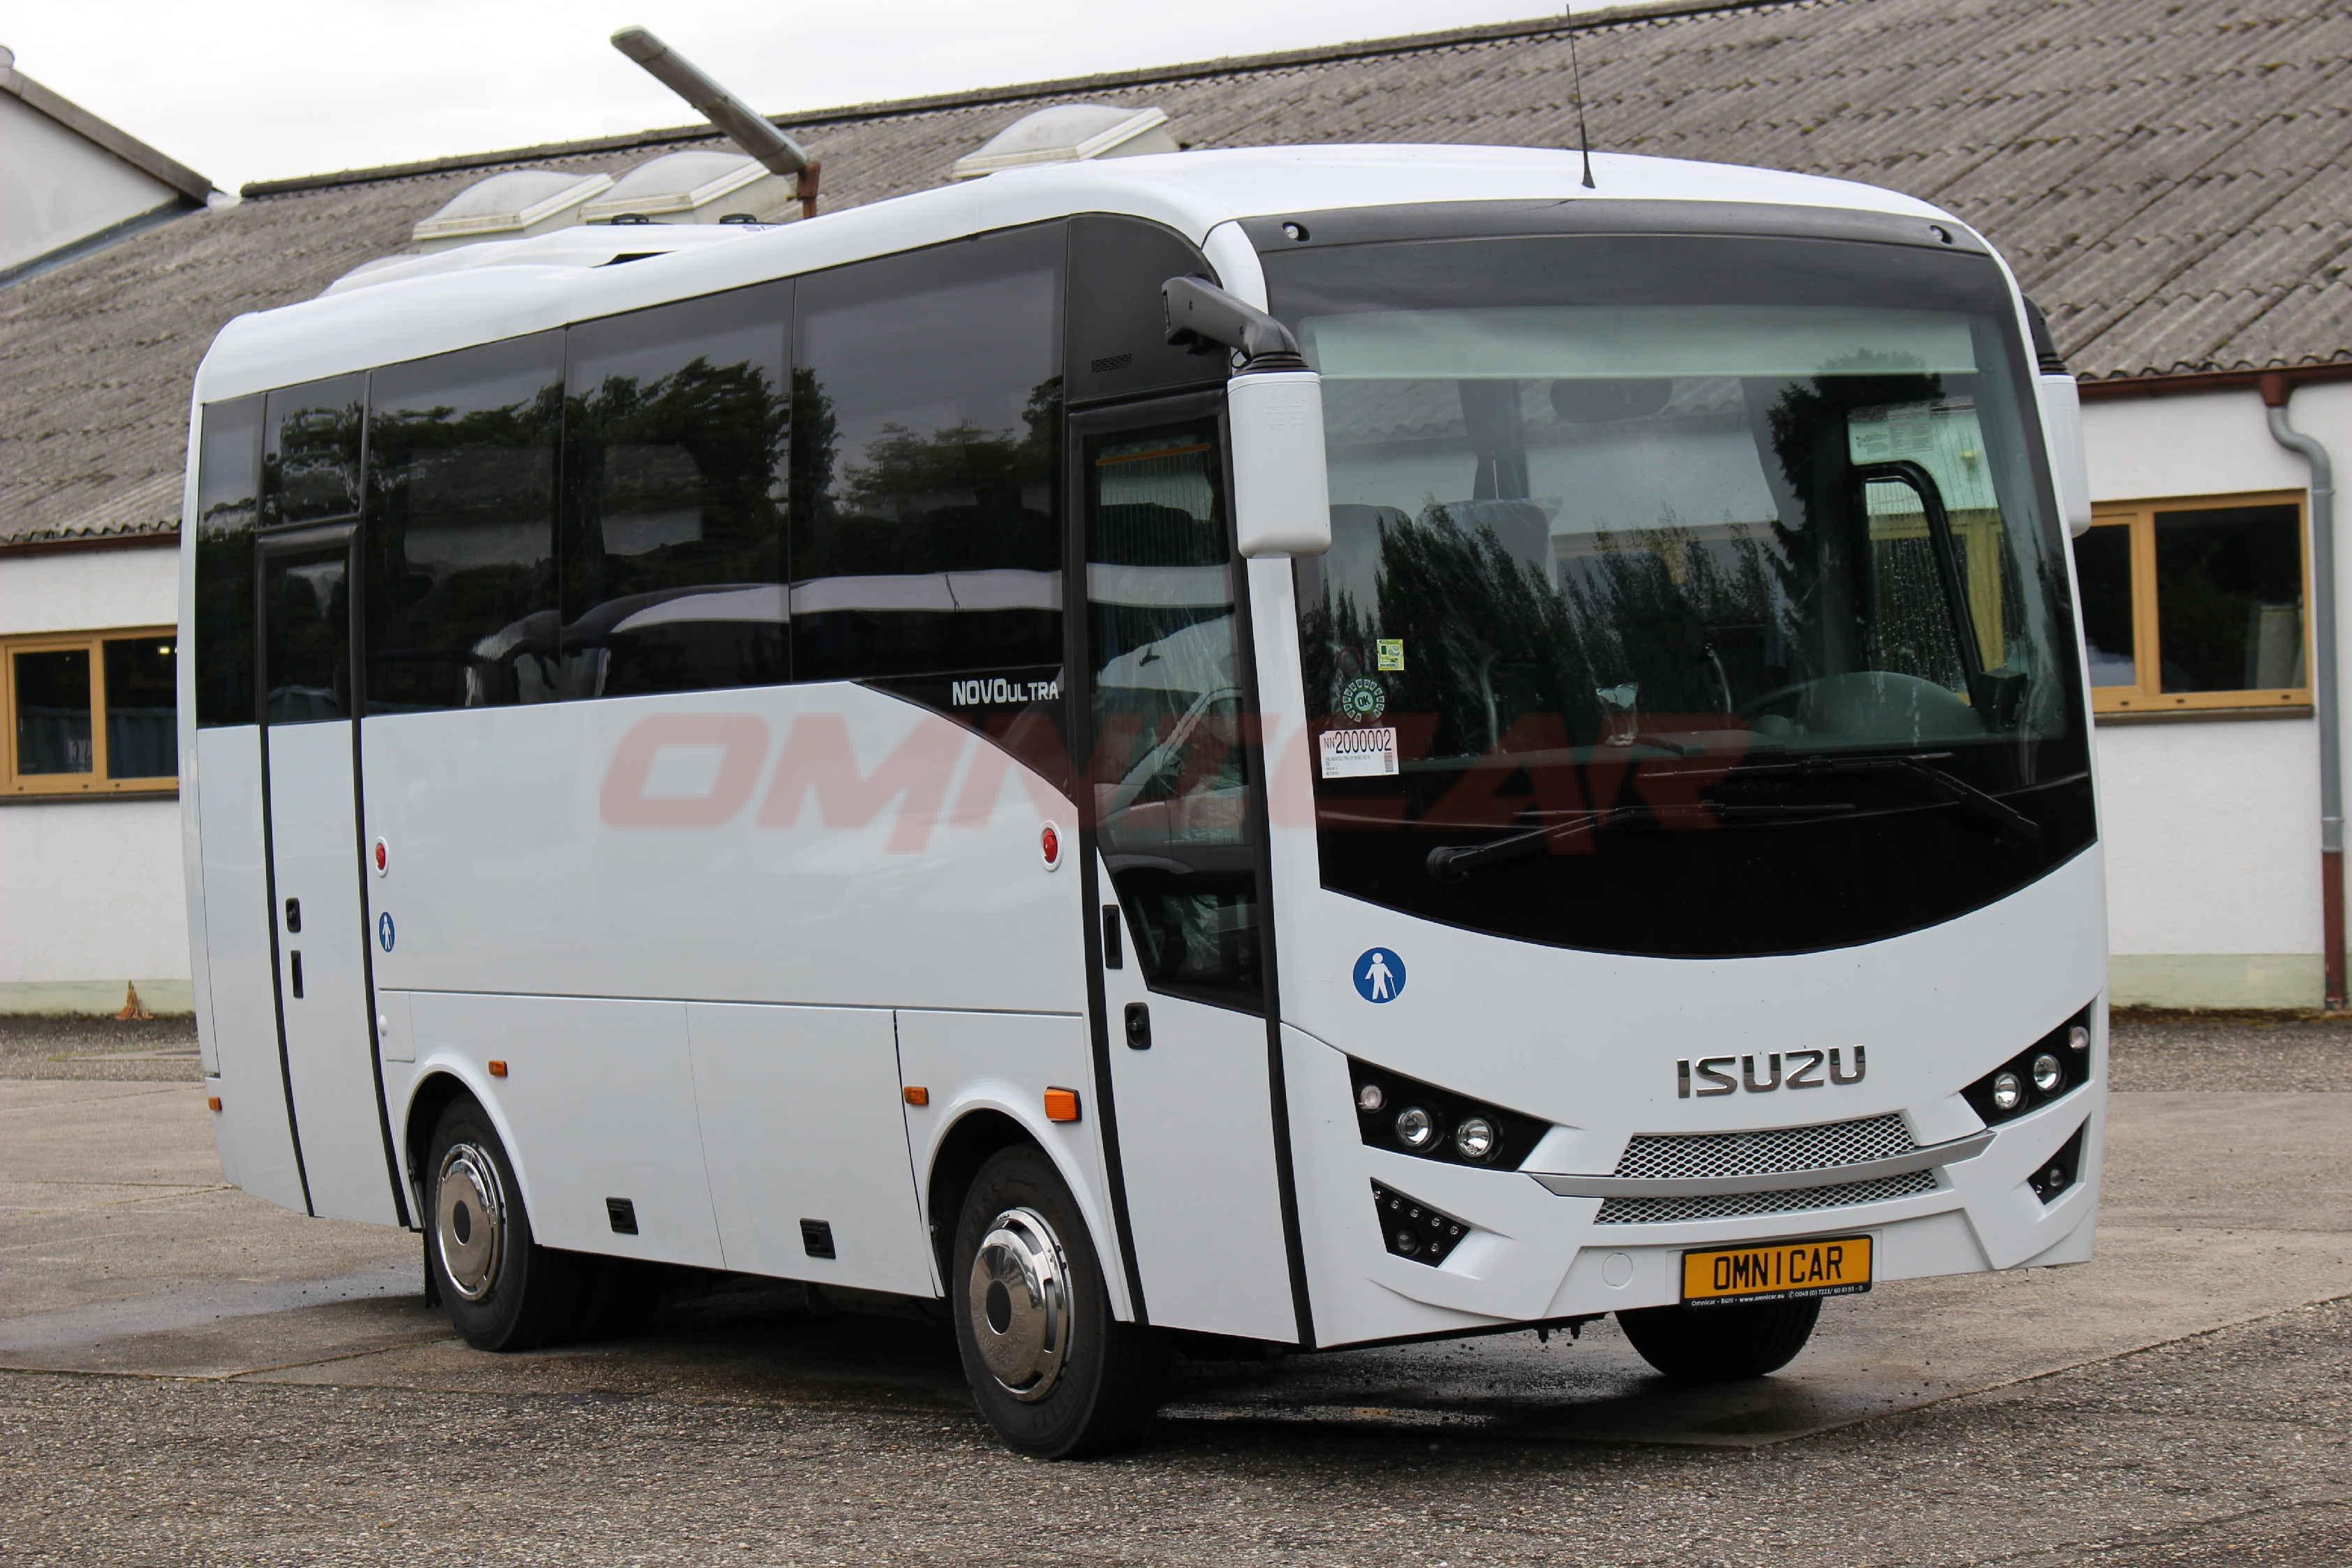 midibusse kleinbusse reisebusse isuzu novo ultra 27 plaetze 4 sterne berlandbusse schulbusse. Black Bedroom Furniture Sets. Home Design Ideas